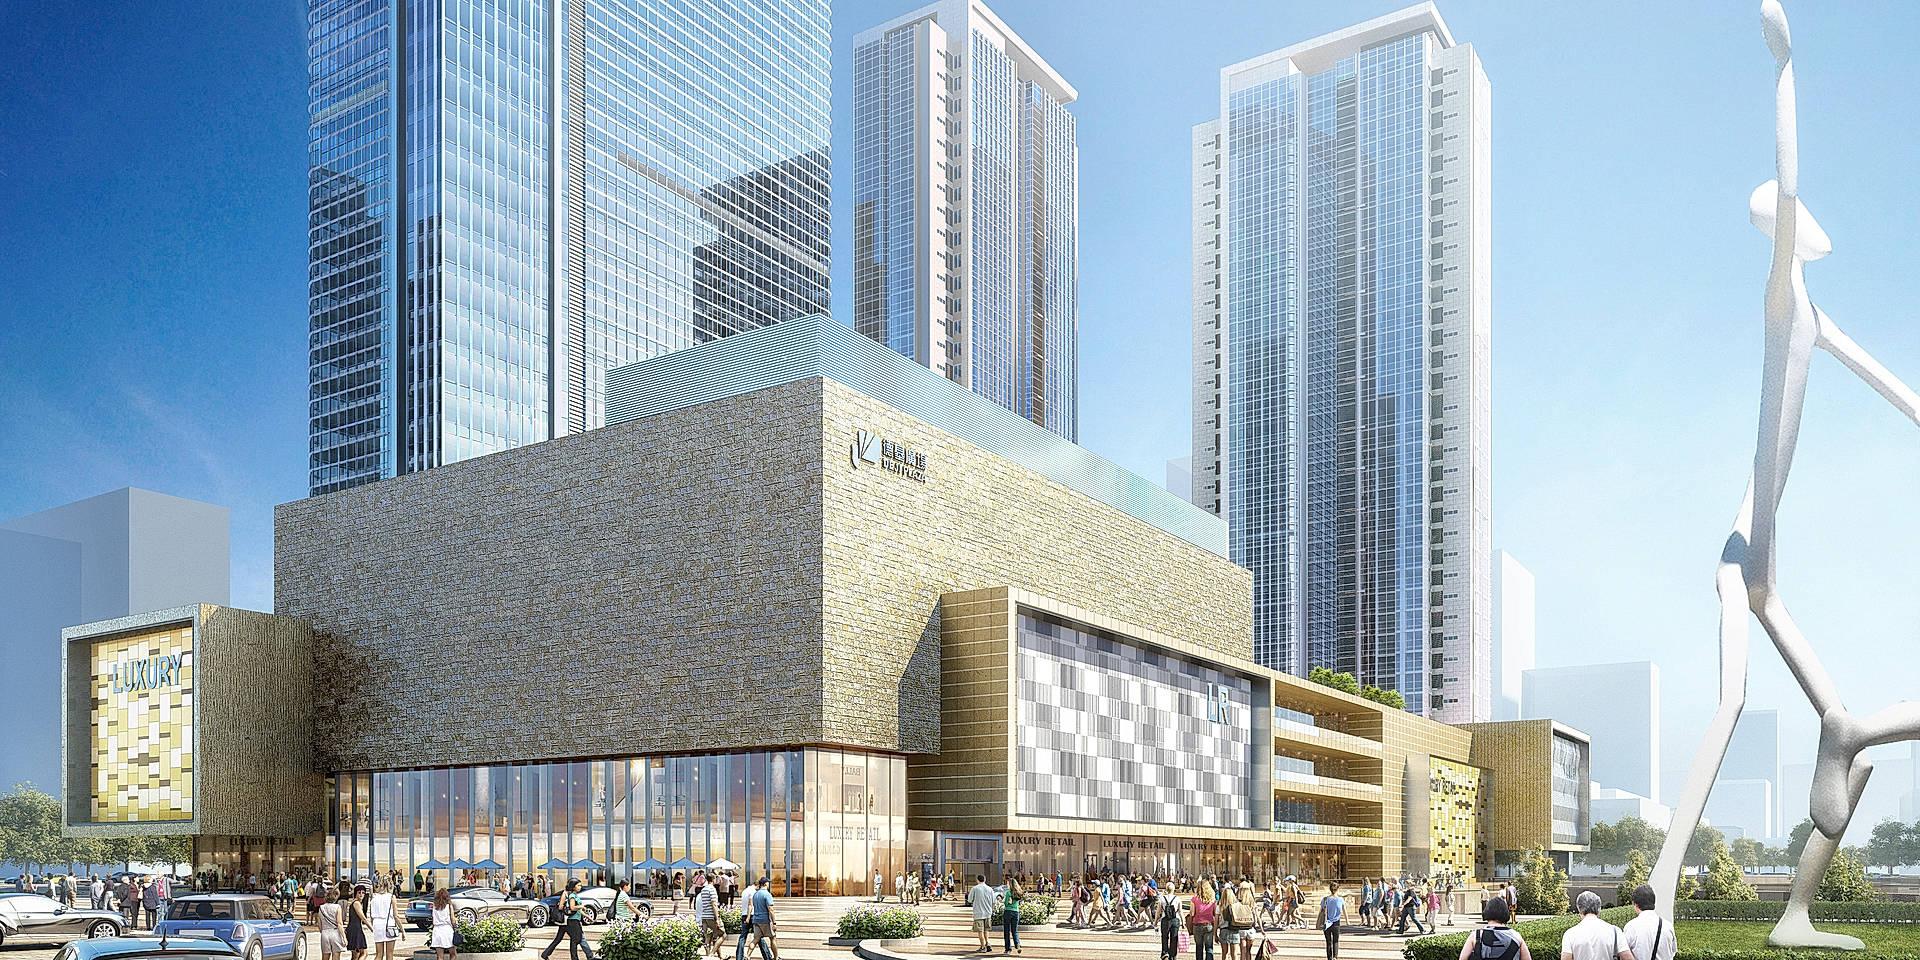 World Trade Center (Retail Podium), Nanjing,China